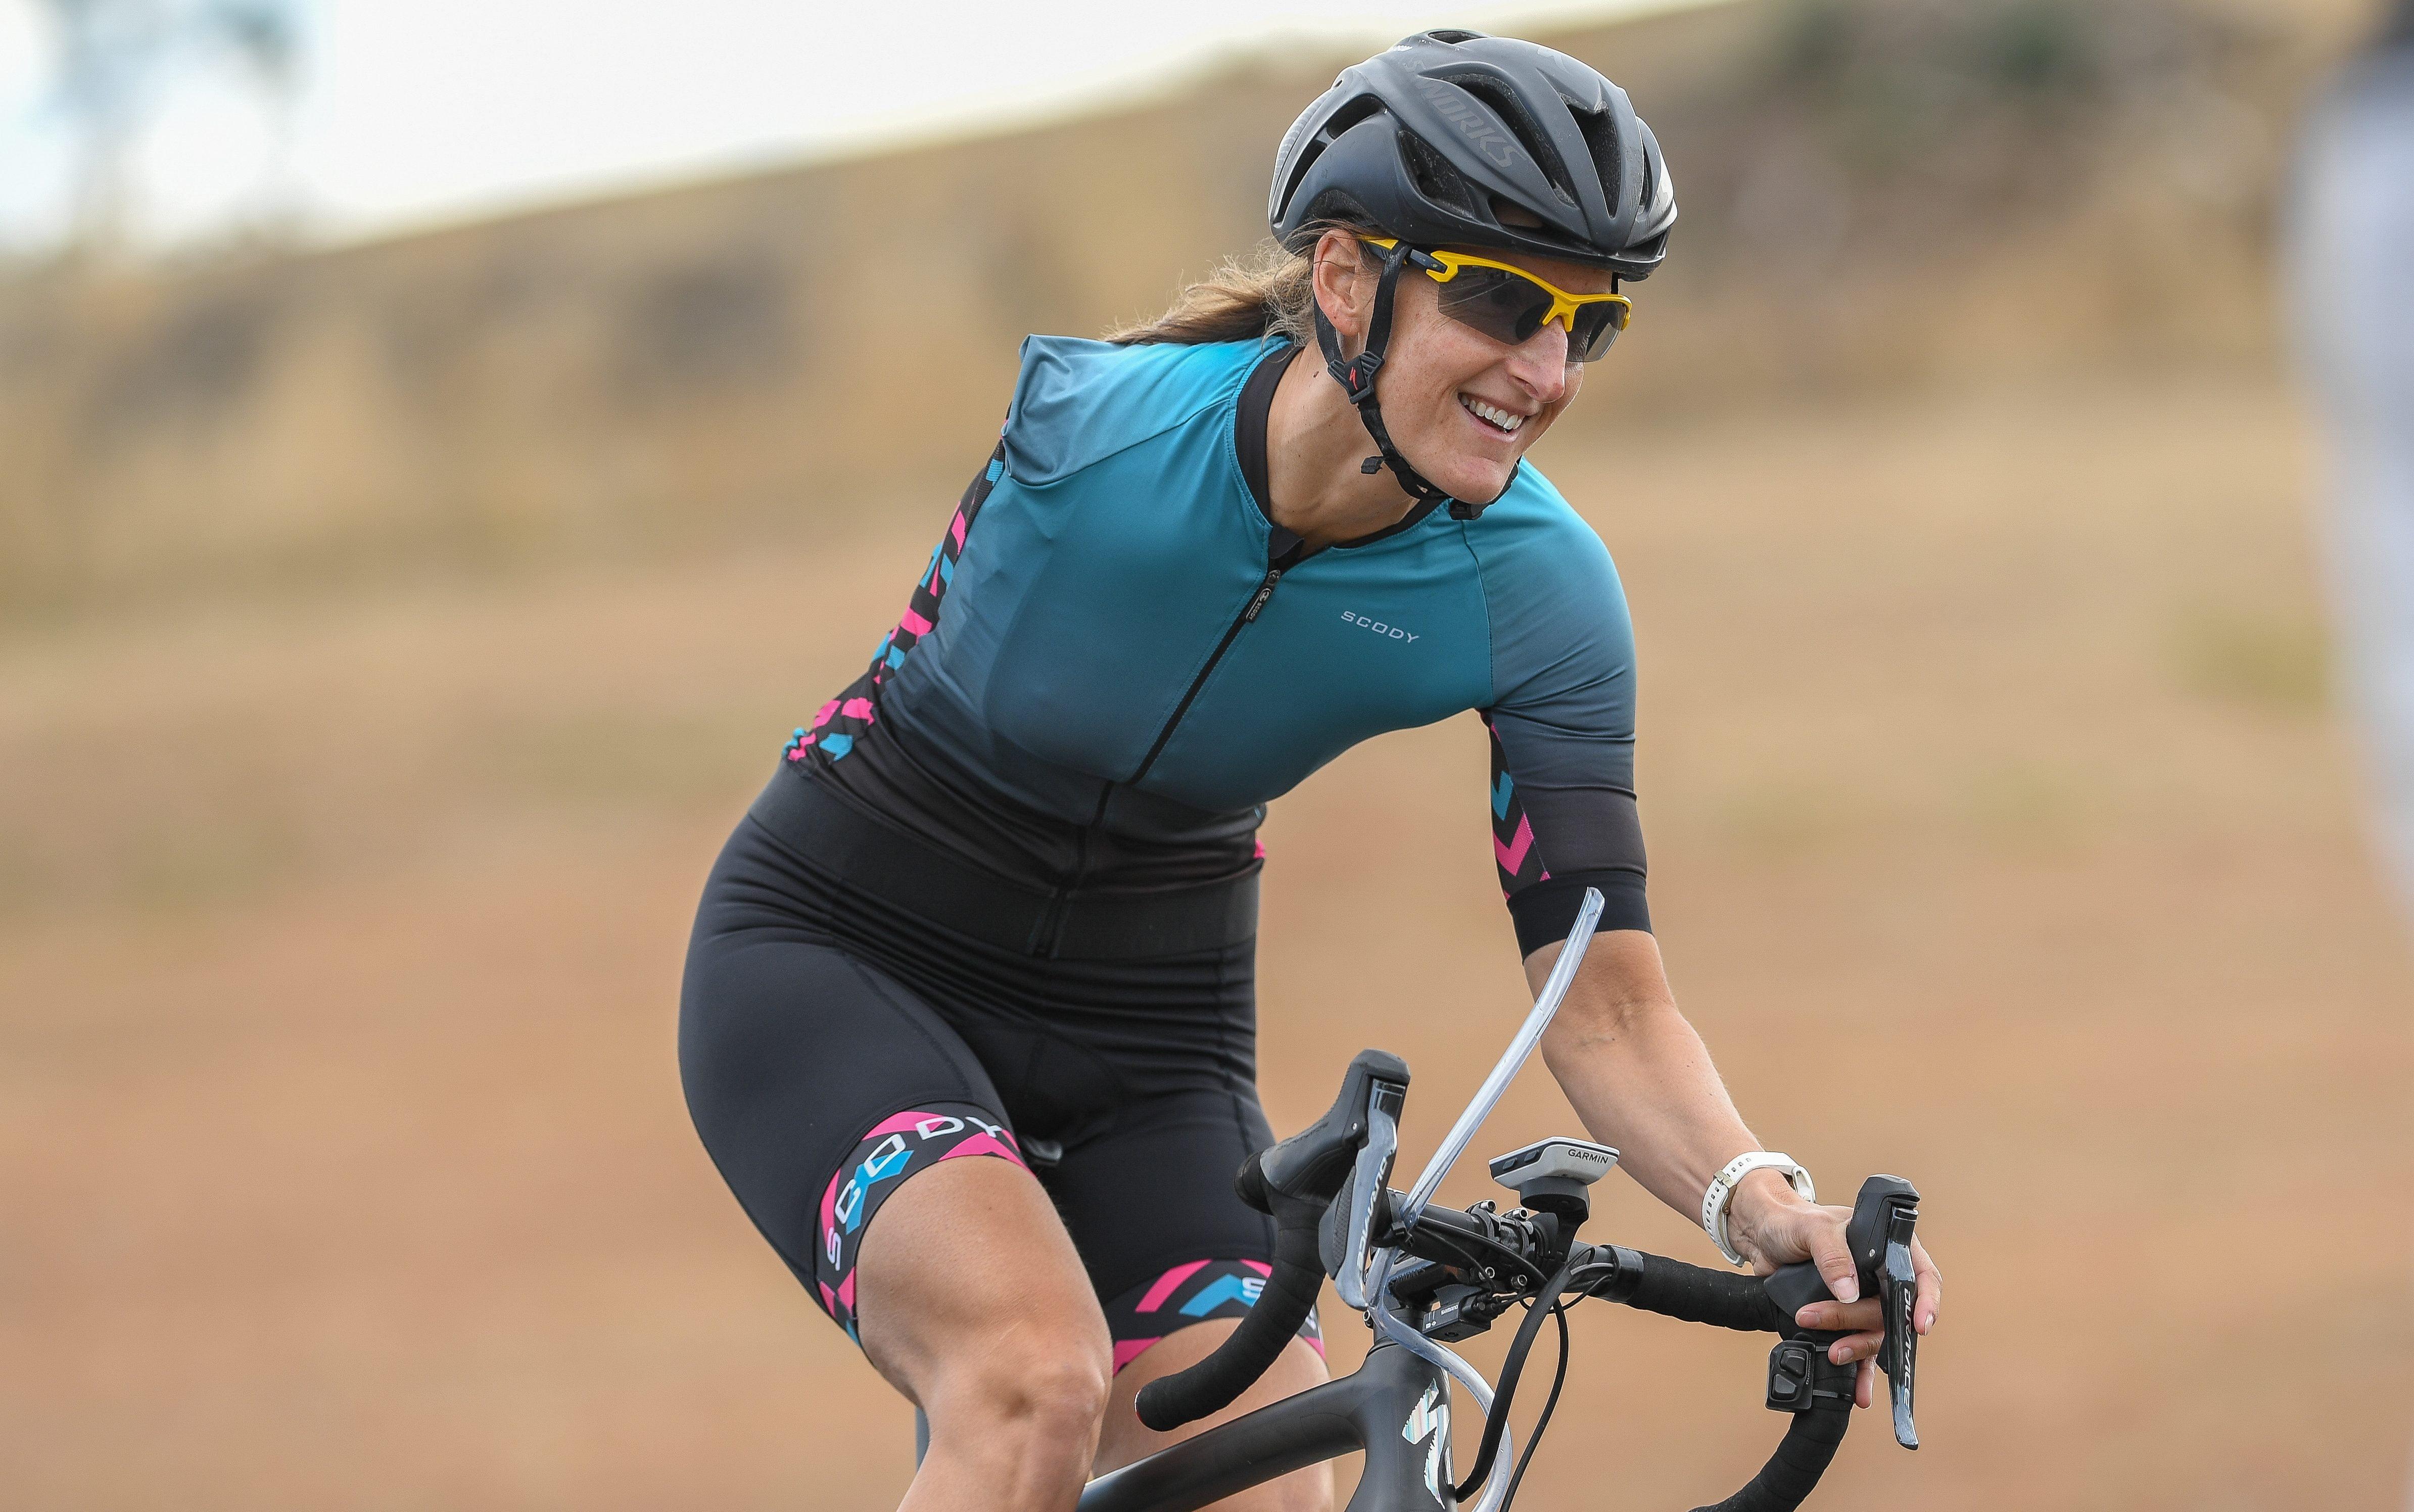 Aussie Para-triathletes eye up medal haul in Lausanne